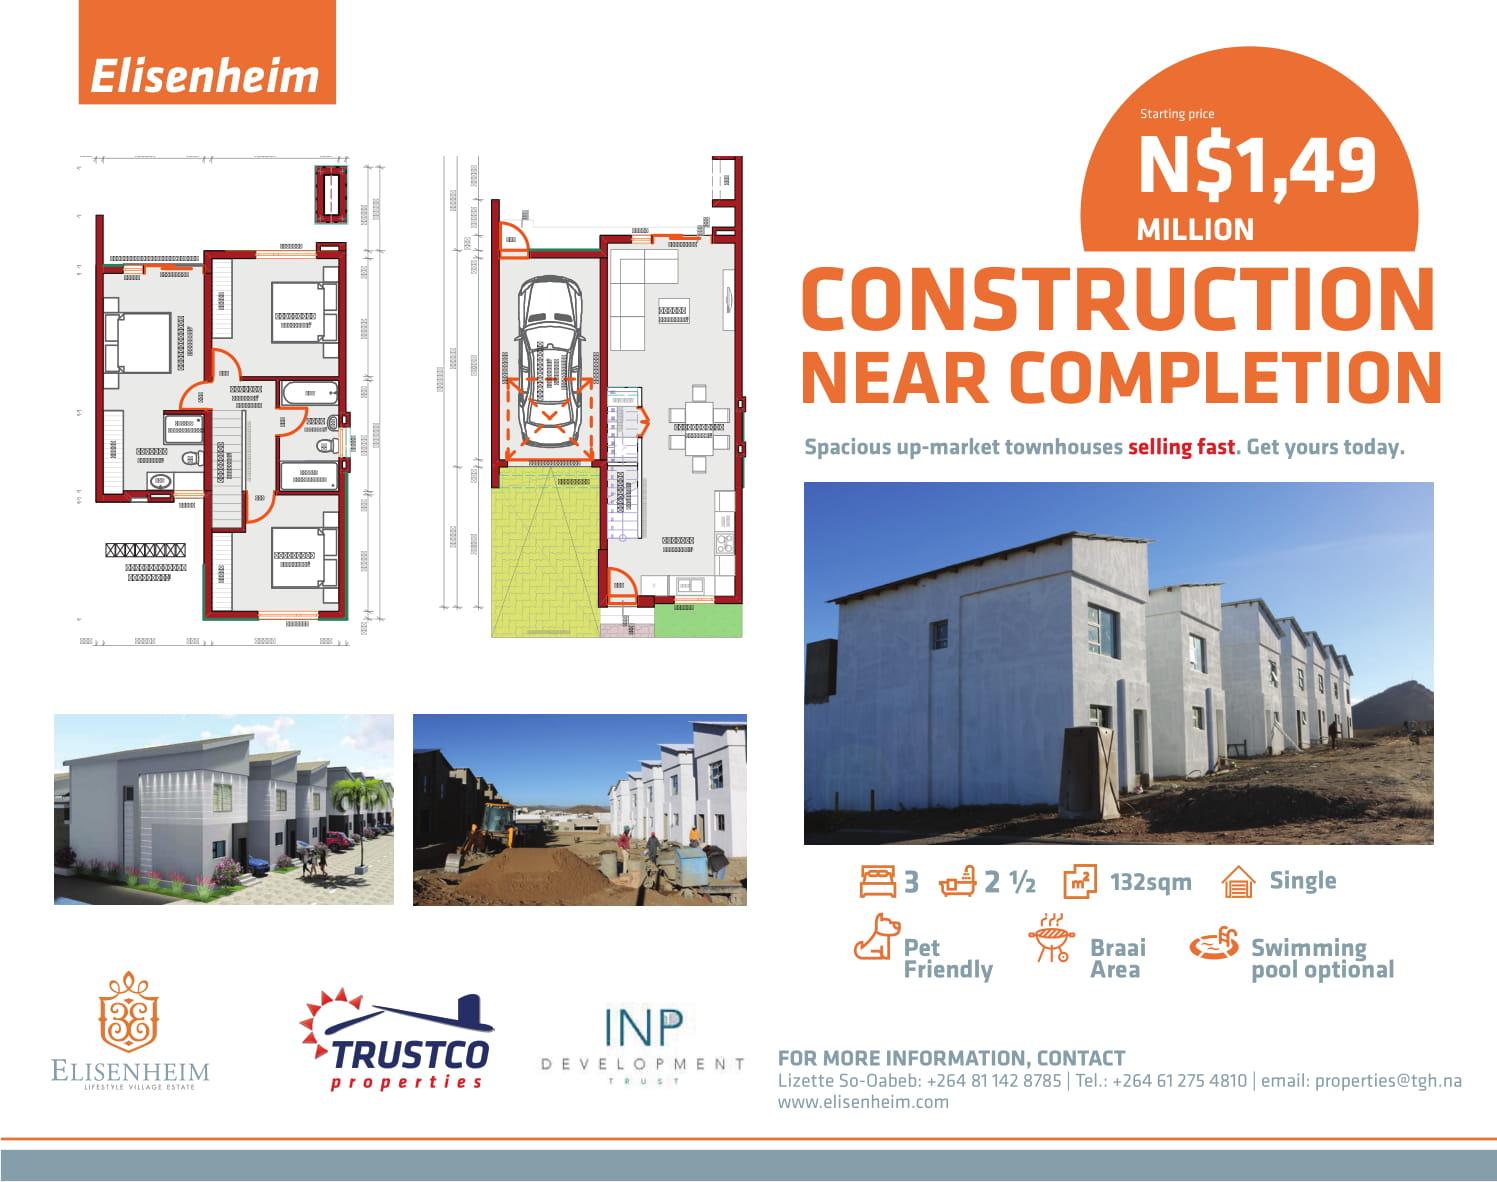 Trustco Properties Ridgeview Estate